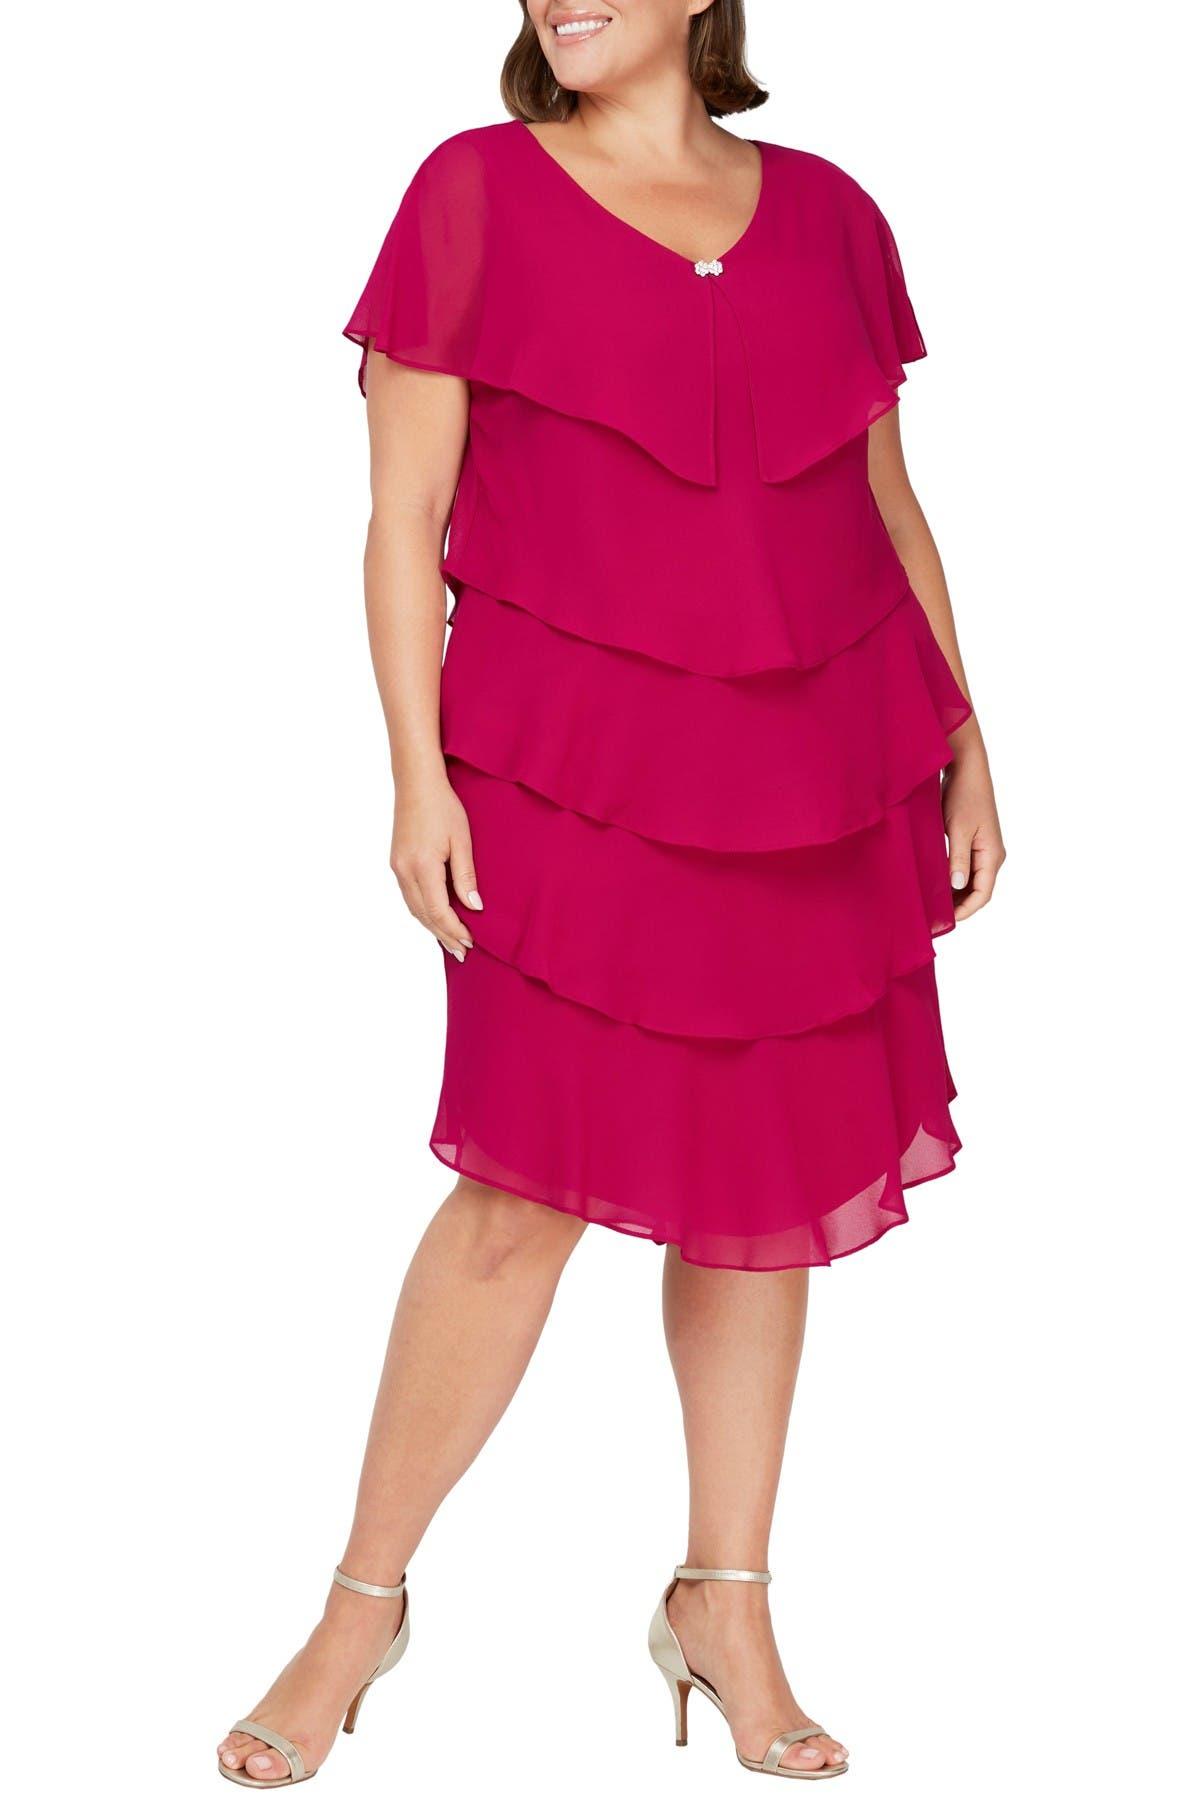 Image of SLNY Pebble Georgette Tiered Dress